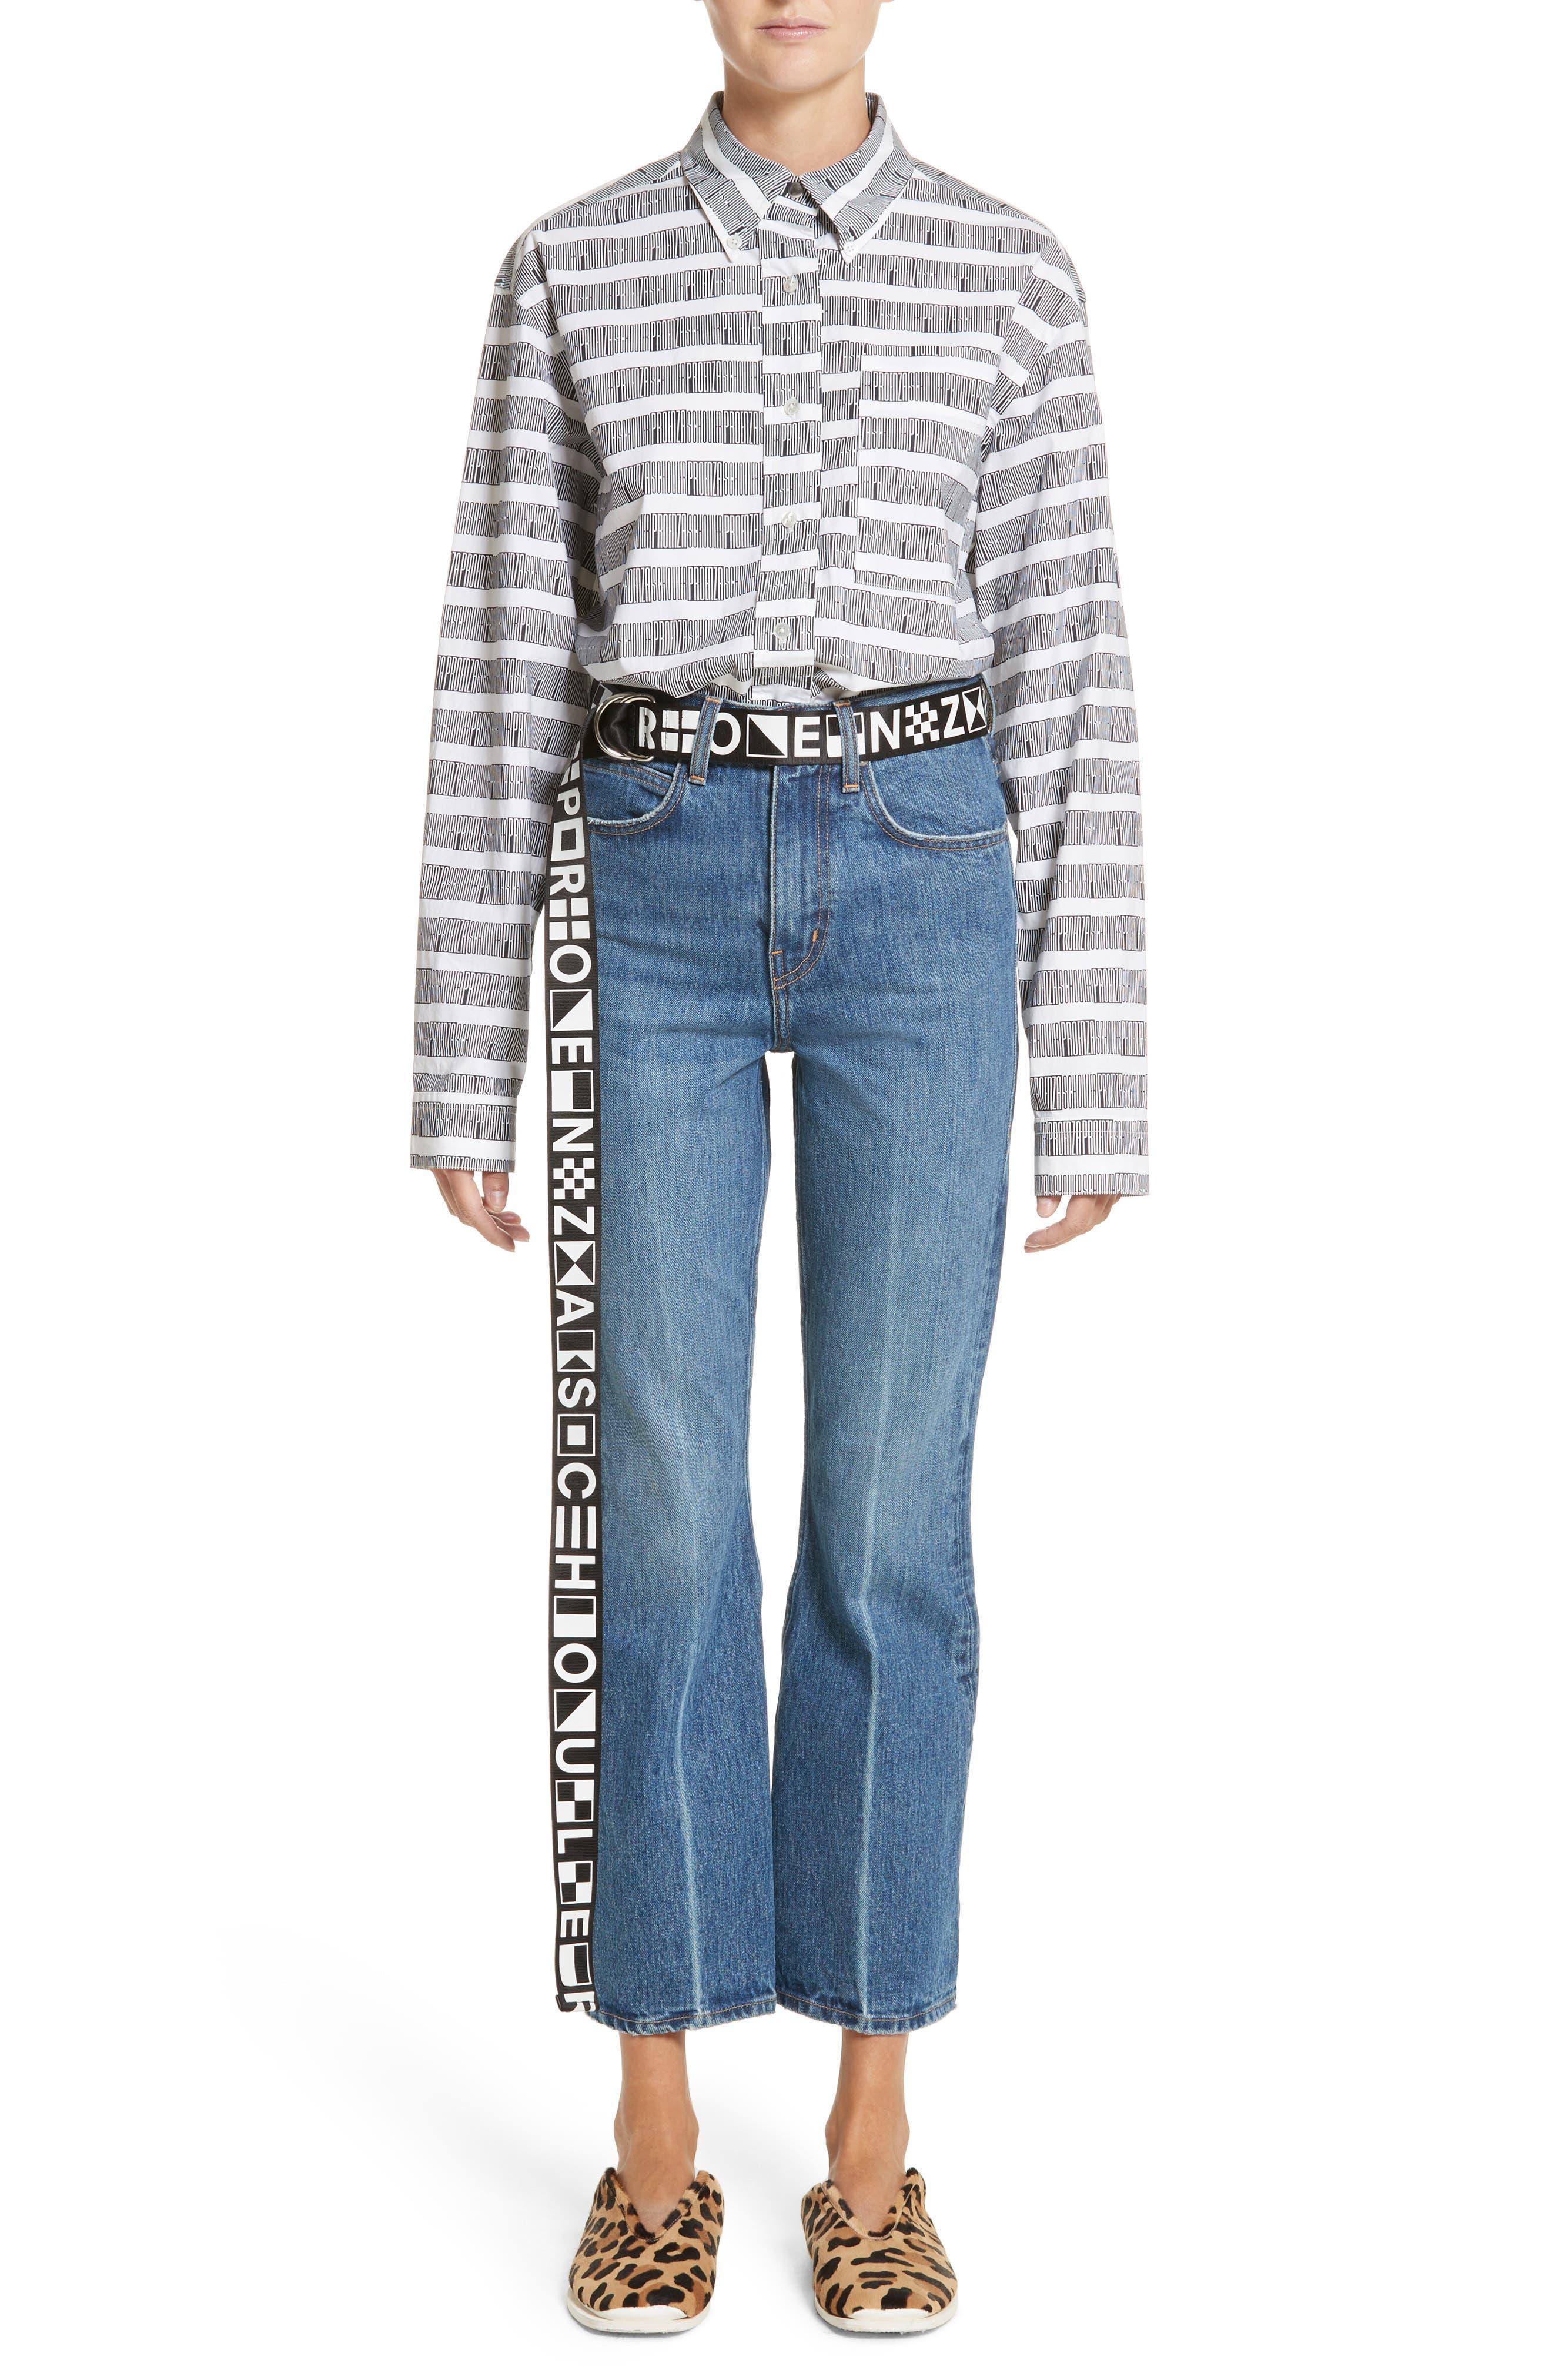 PSWL Graphic Stripe Cotton Top,                             Alternate thumbnail 6, color,                             001